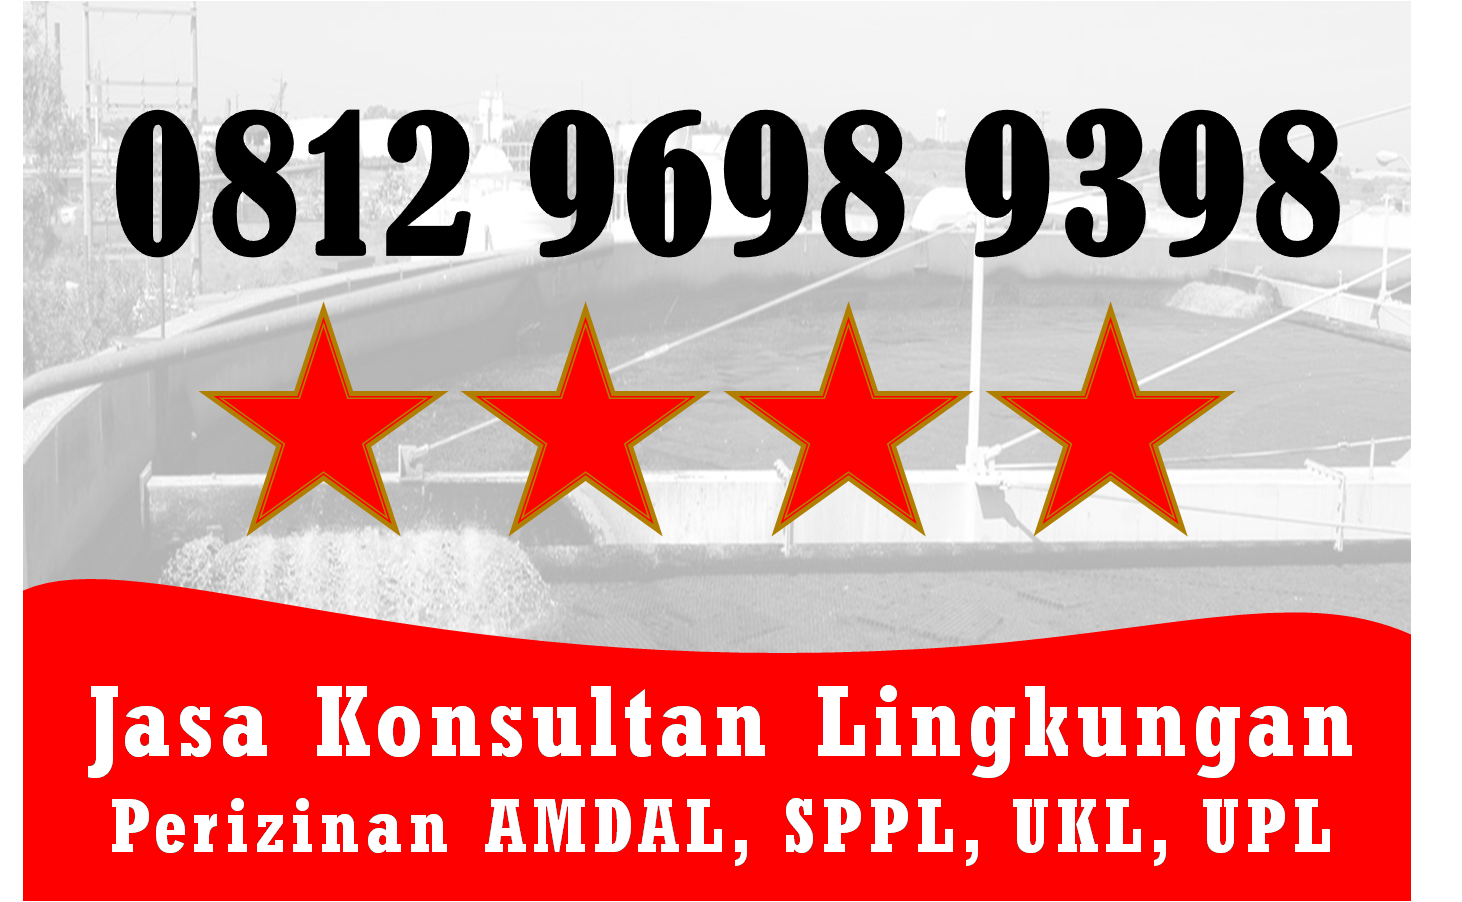 Hanya Disini Telp Wa 0812 9698 9398 Jasa Upl Kab Bolaang Mongondow Utara Sulawesi Utara Di 2020 Teknik Lingkungan Kota Bukittinggi Pulau Bangka